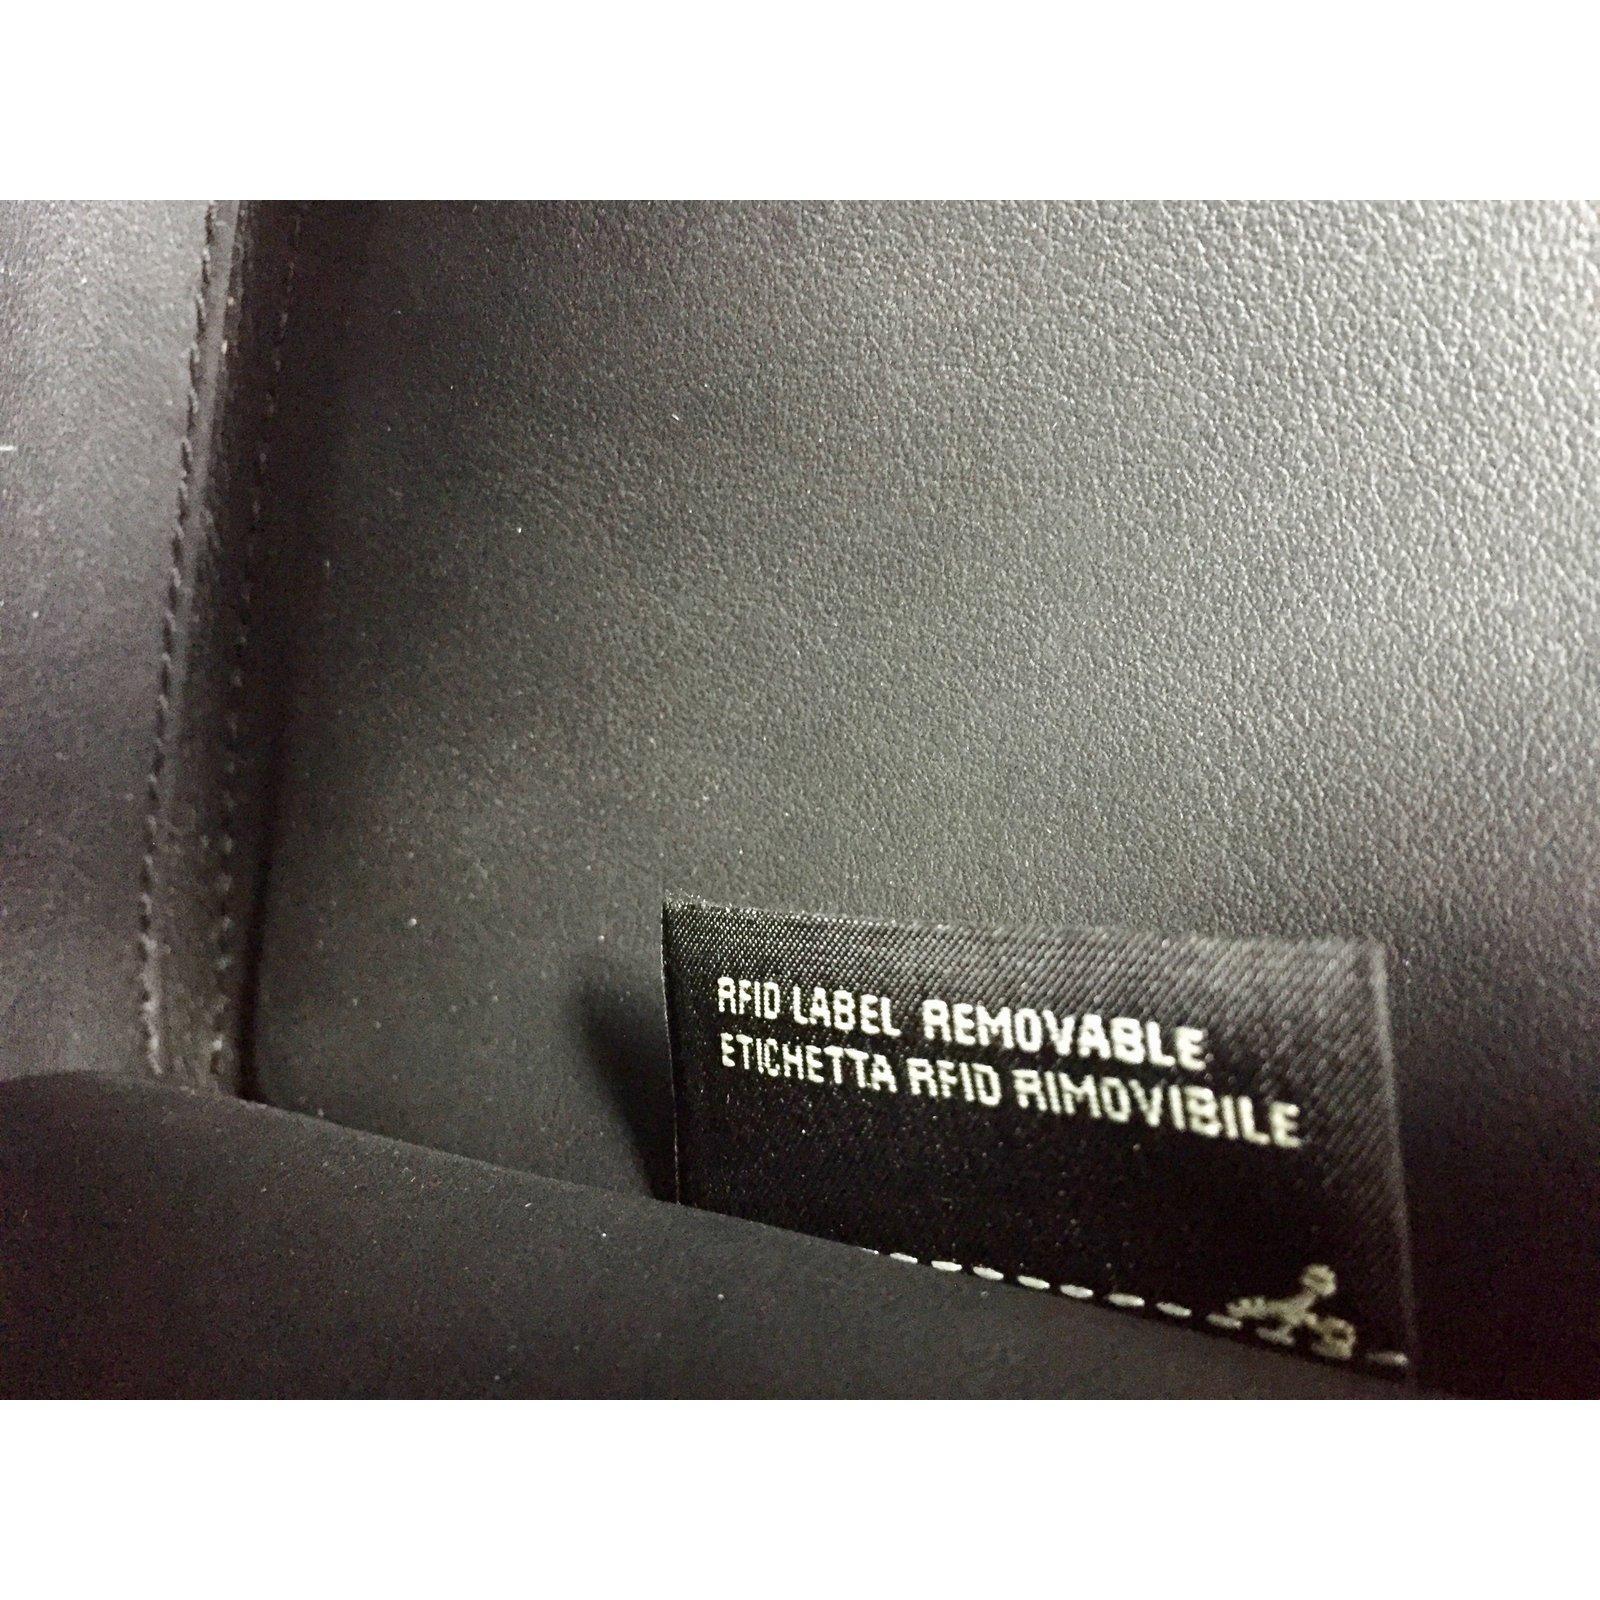 ... quality design 9aae8 dbe9e Fendi Fendi Petite 2jours Handbags Leather  Black ref.67920 ... c5479e0c1d8cb